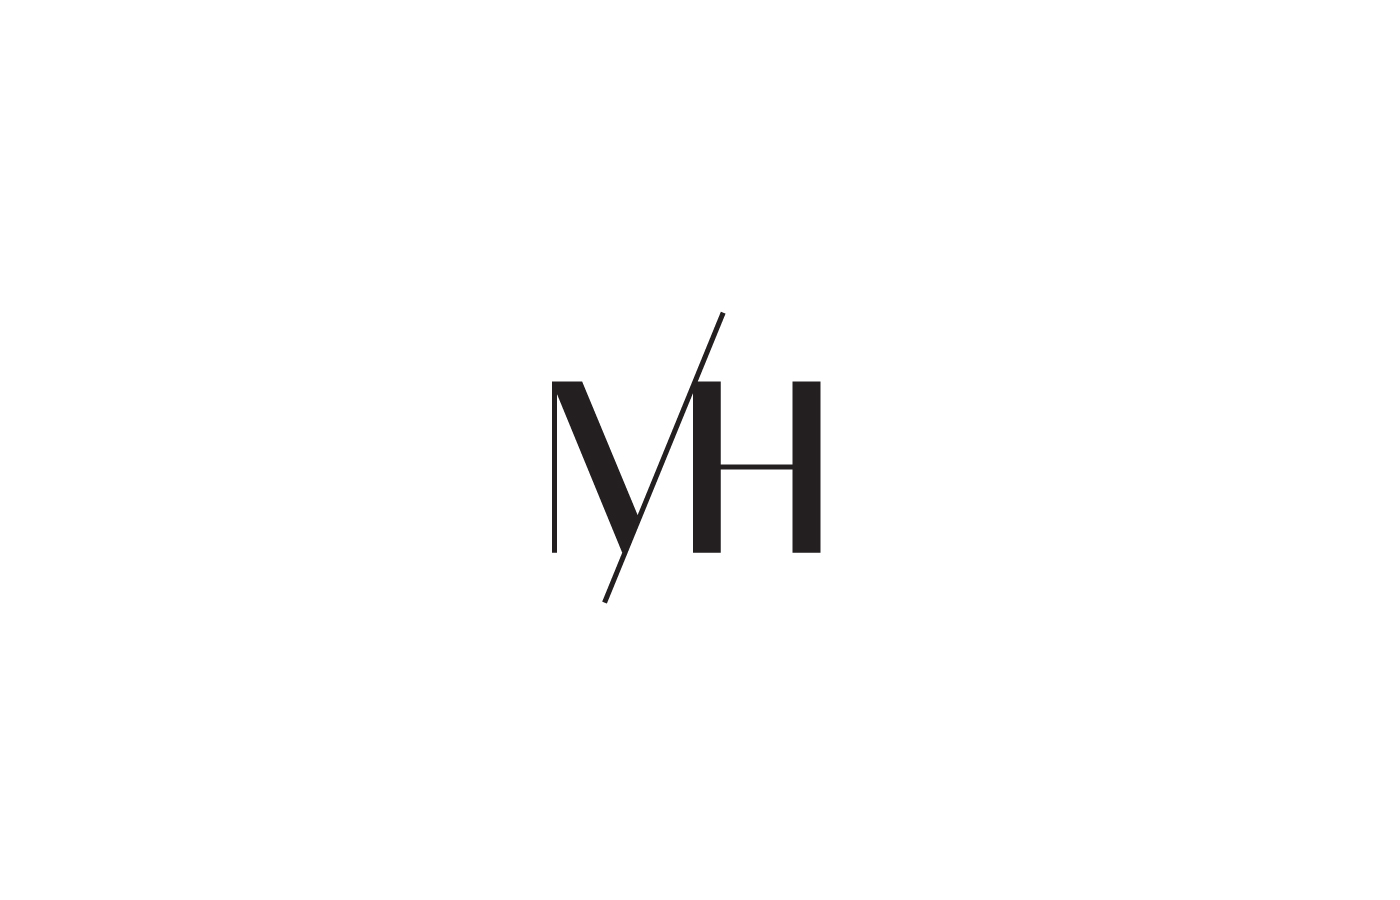 logos_2015-16-02.jpg